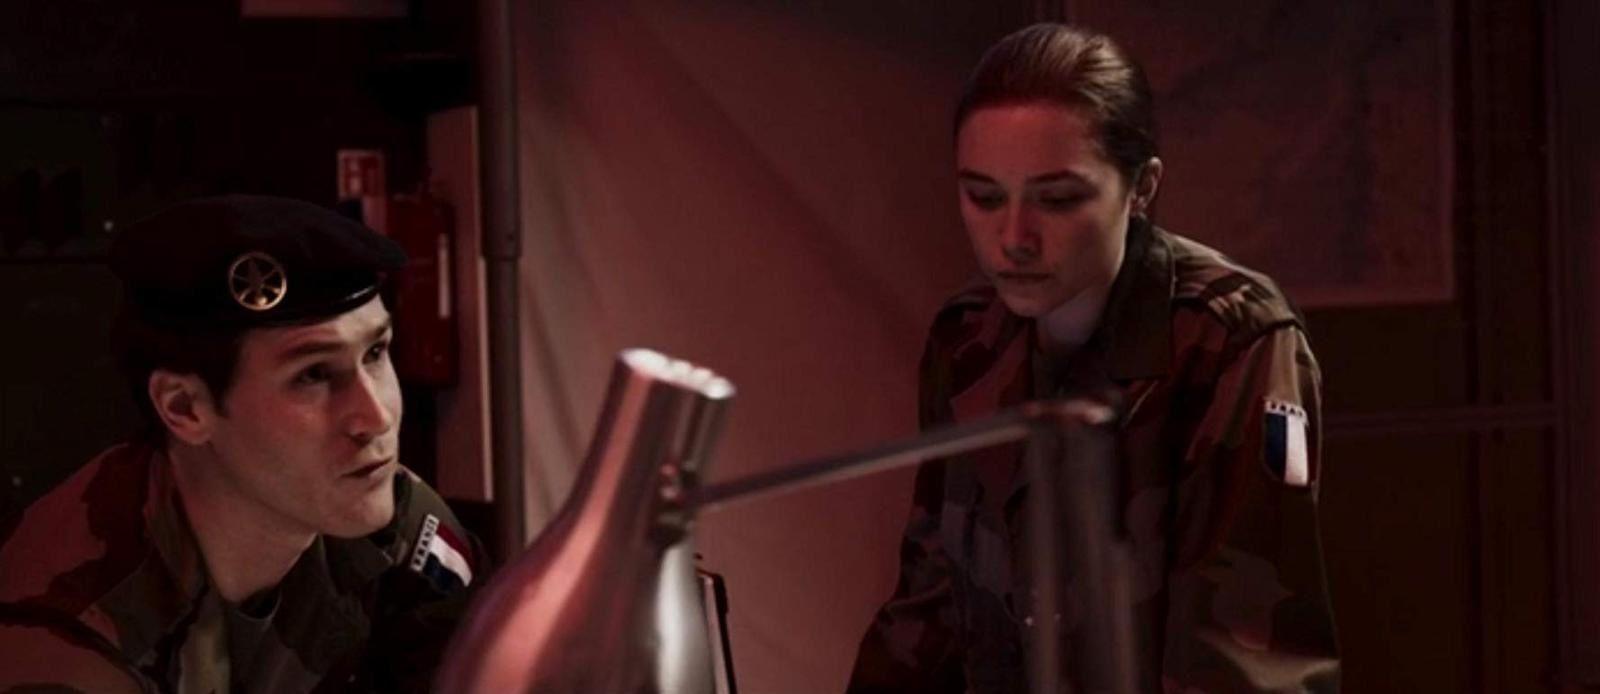 King Lear (BANDE-ANNONCE) avec Anthony Hopkins, Jim Broadbent, Emily Watson, Emma Thompson